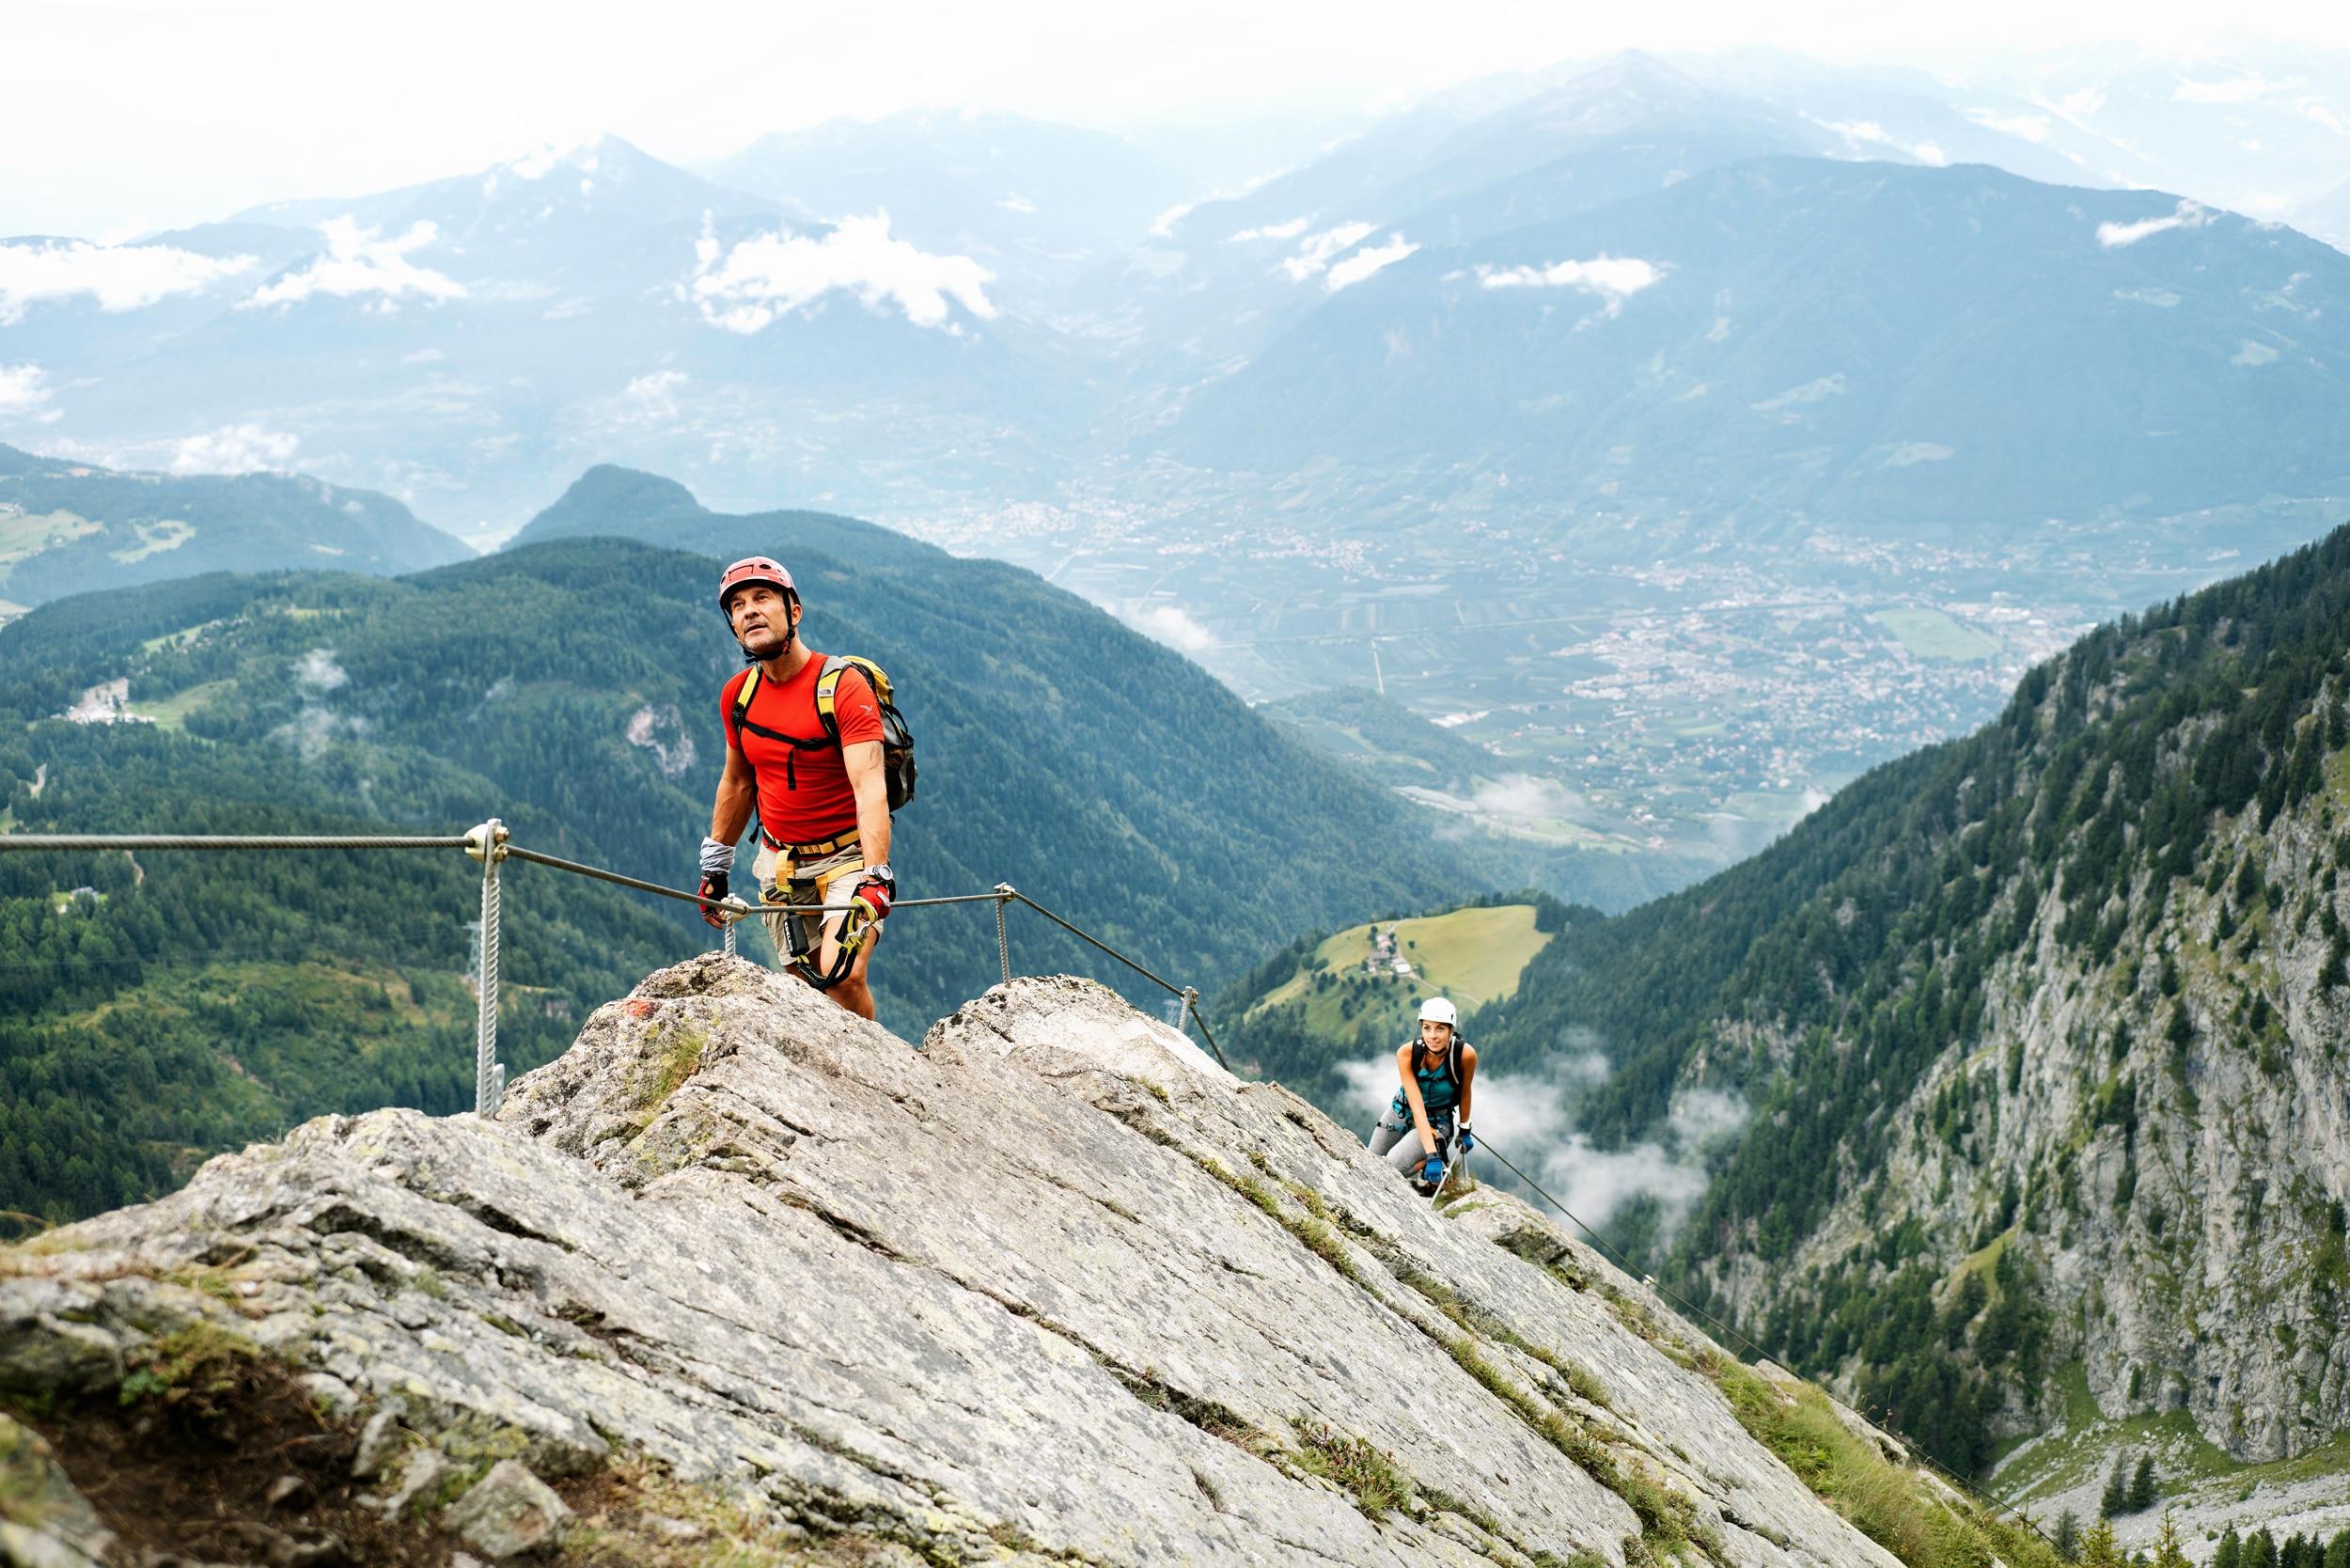 Klettersteig Fall : Klettersteig archive berchtesgadener land